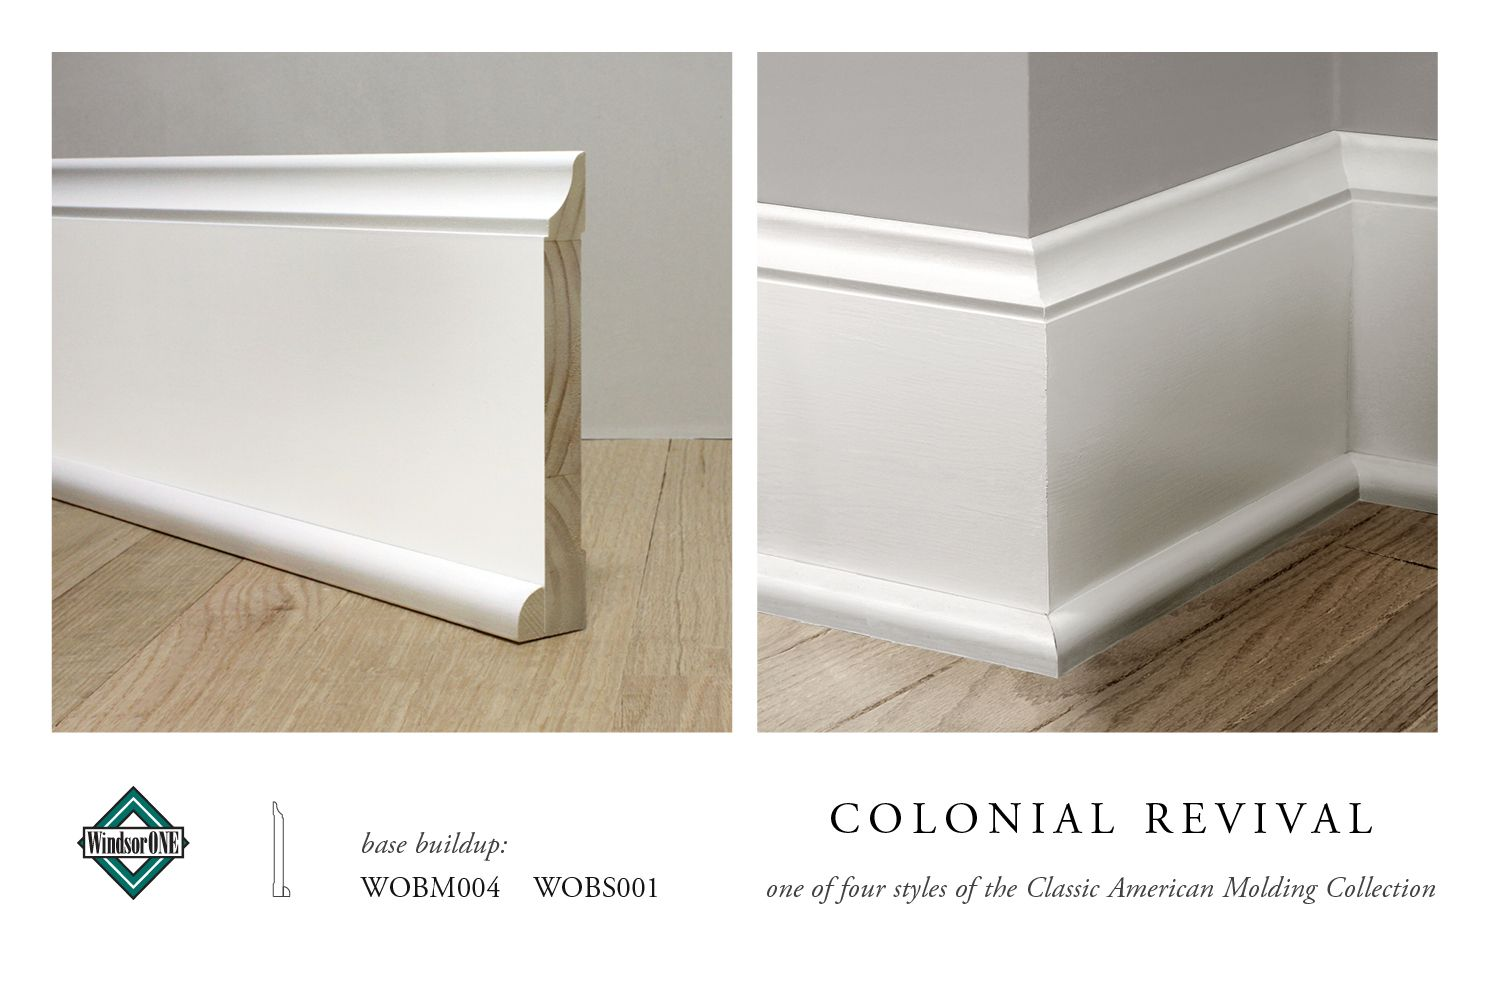 Colonial Revival Moldings, 20th century style | Mermaid Lane